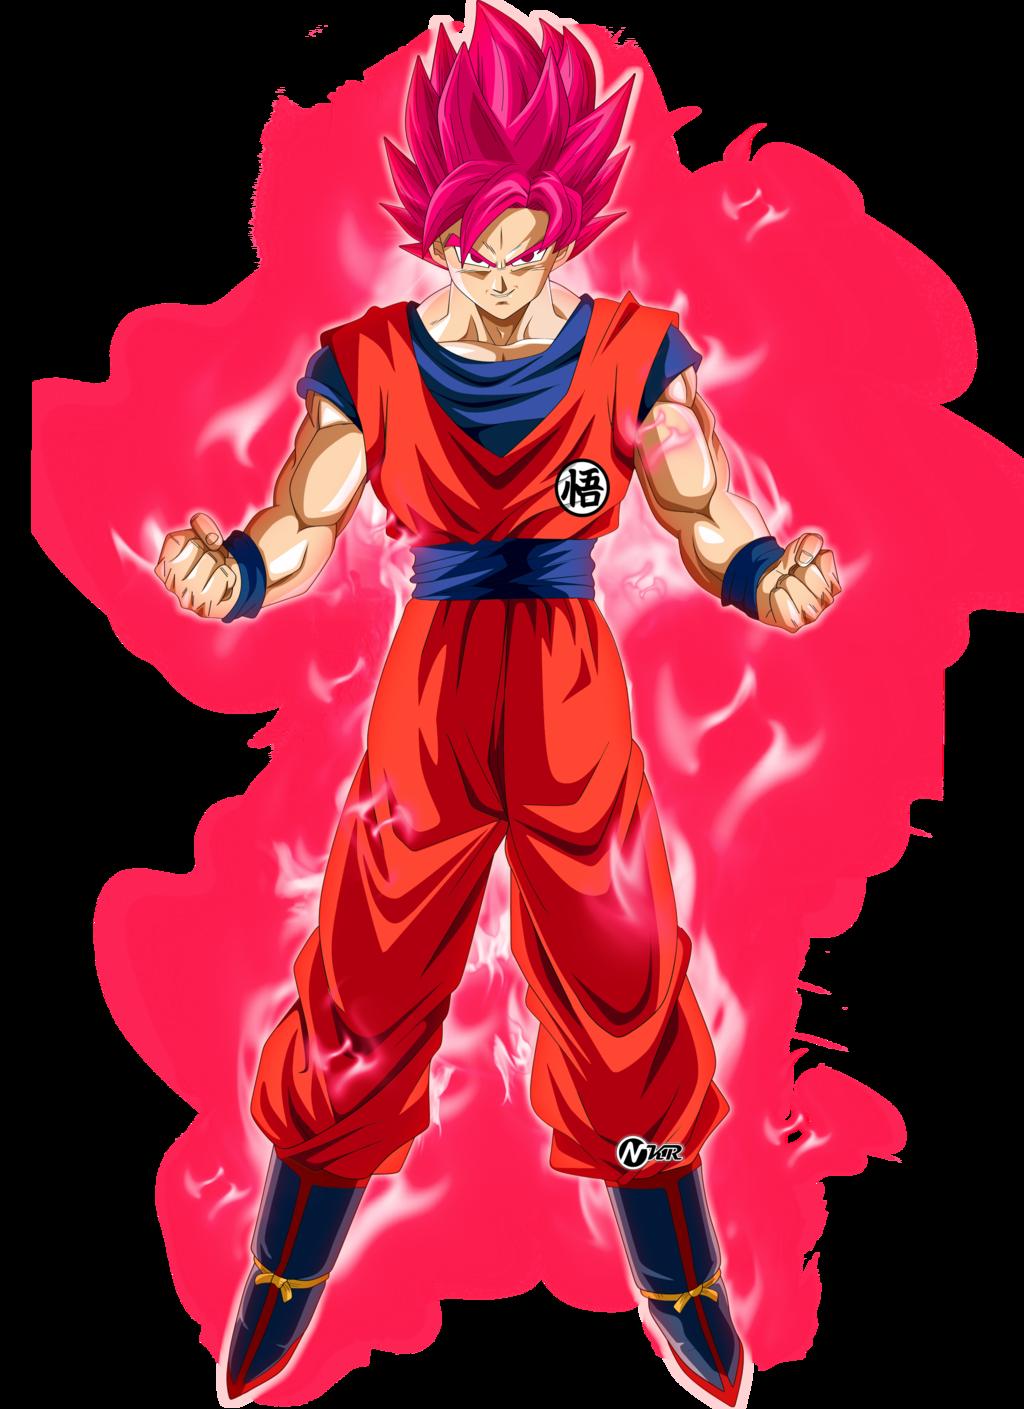 Goku Ssj Rojo Kaioken By Naironkr Db5ifu6 Png 1024 1409 Personajes De Goku Personajes De Dragon Ball Goku Fase Dios Rojo